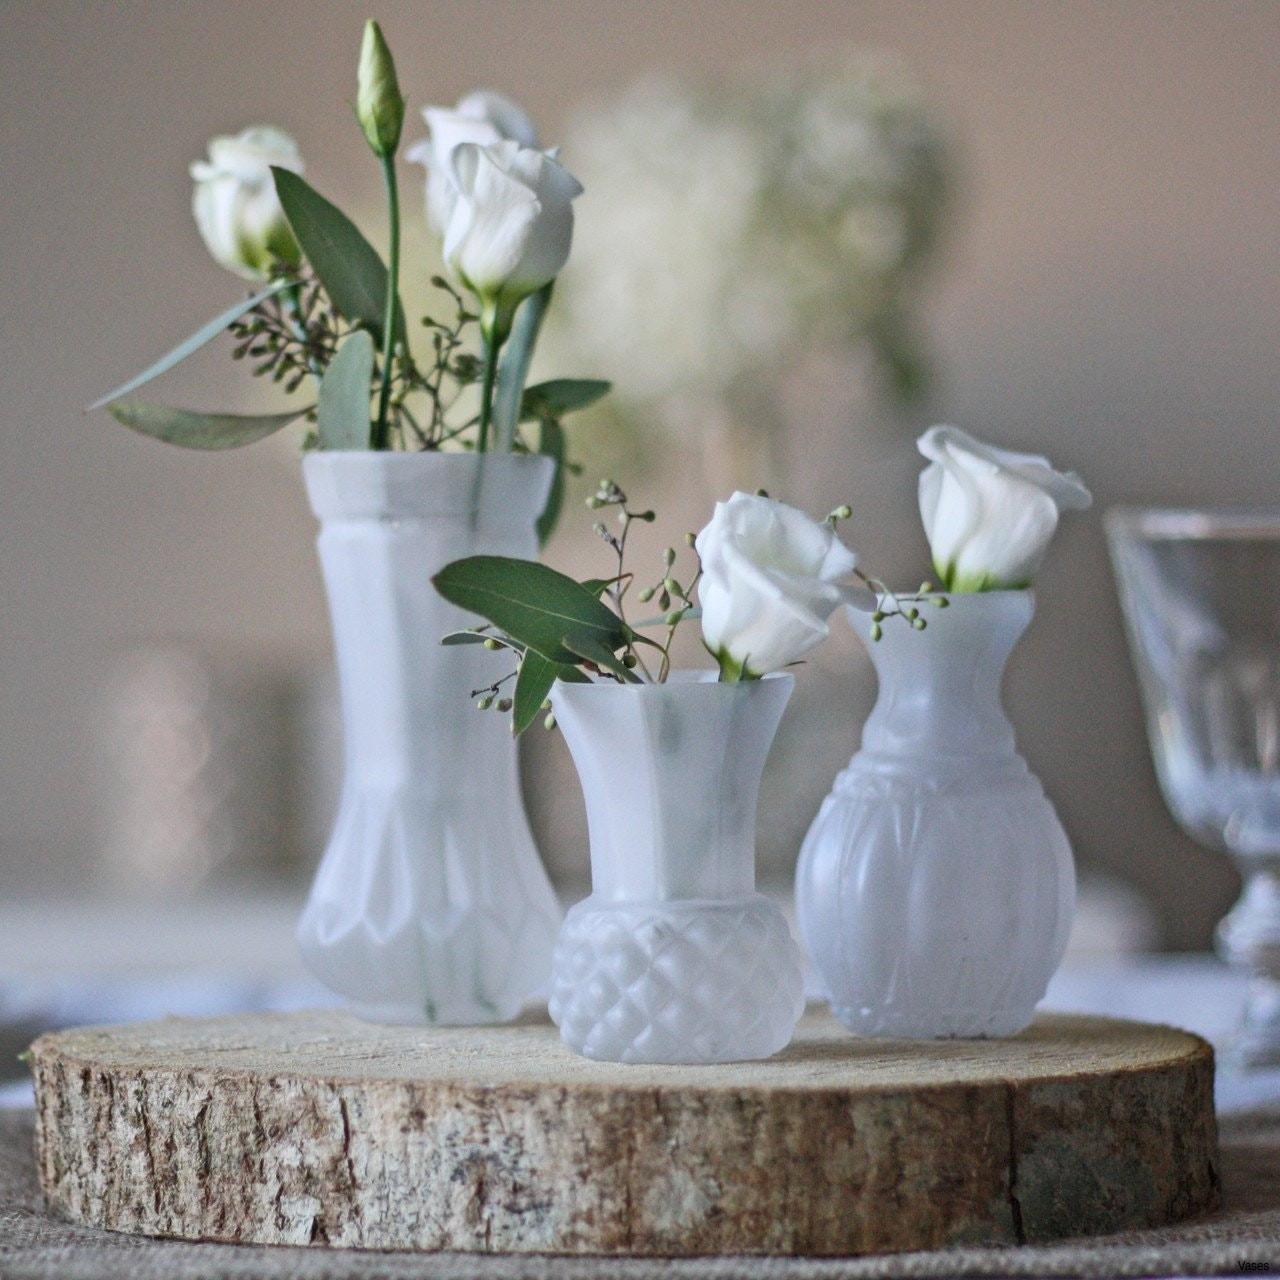 recycled glass bottle vase of glass bud vases photograph small glass shower awesome glass bottle throughout glass bud vases stock jar flower 1h vases bud wedding vase centerpiece idea i 0d white